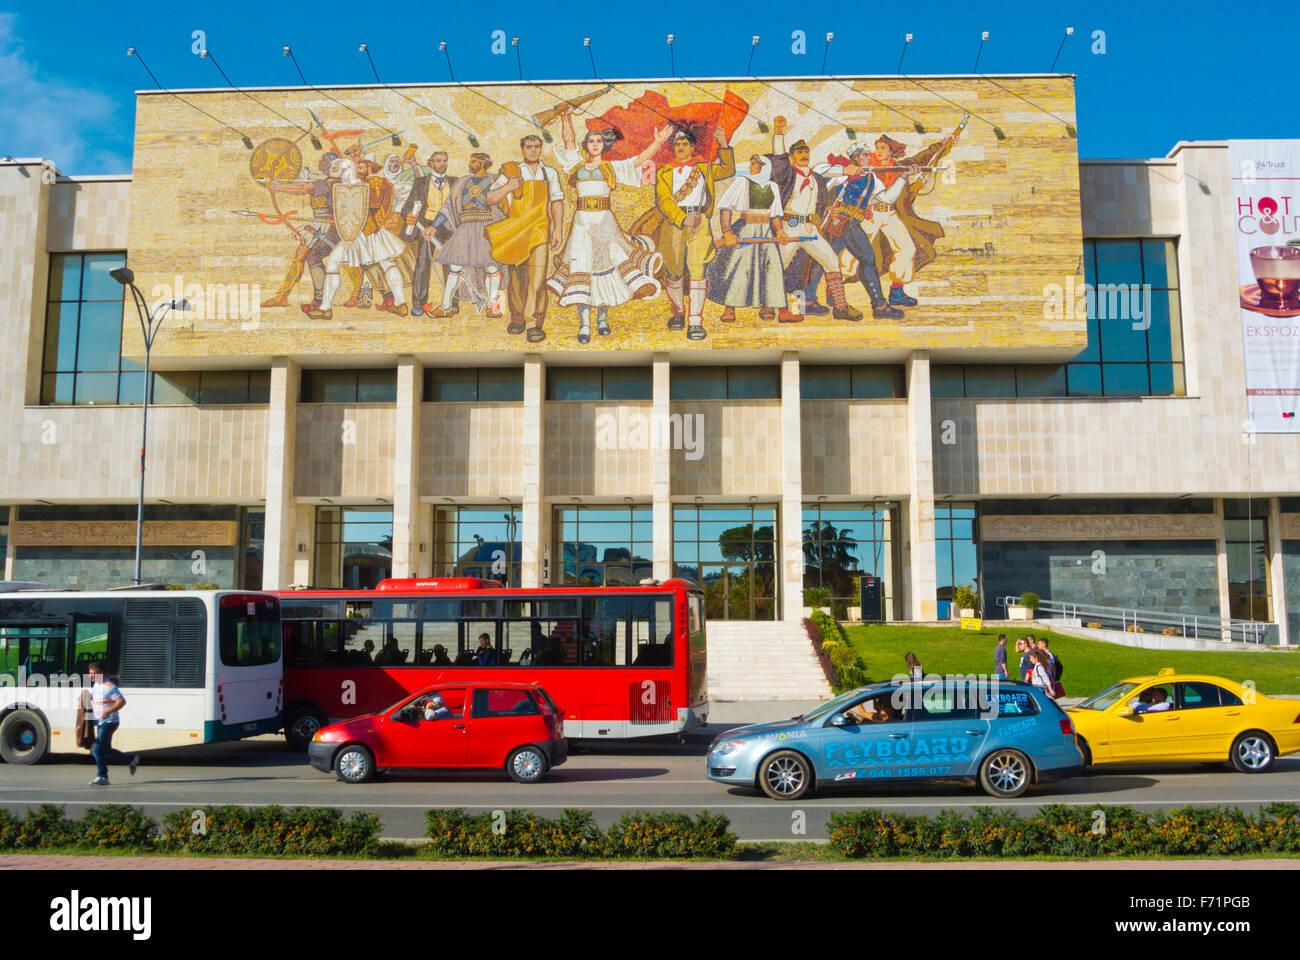 Muzeu Historik Kombetar, National History Museum, Sheshi Skenderbej,Skanderbeg square, main square, Tirana, Albania - Stock Image